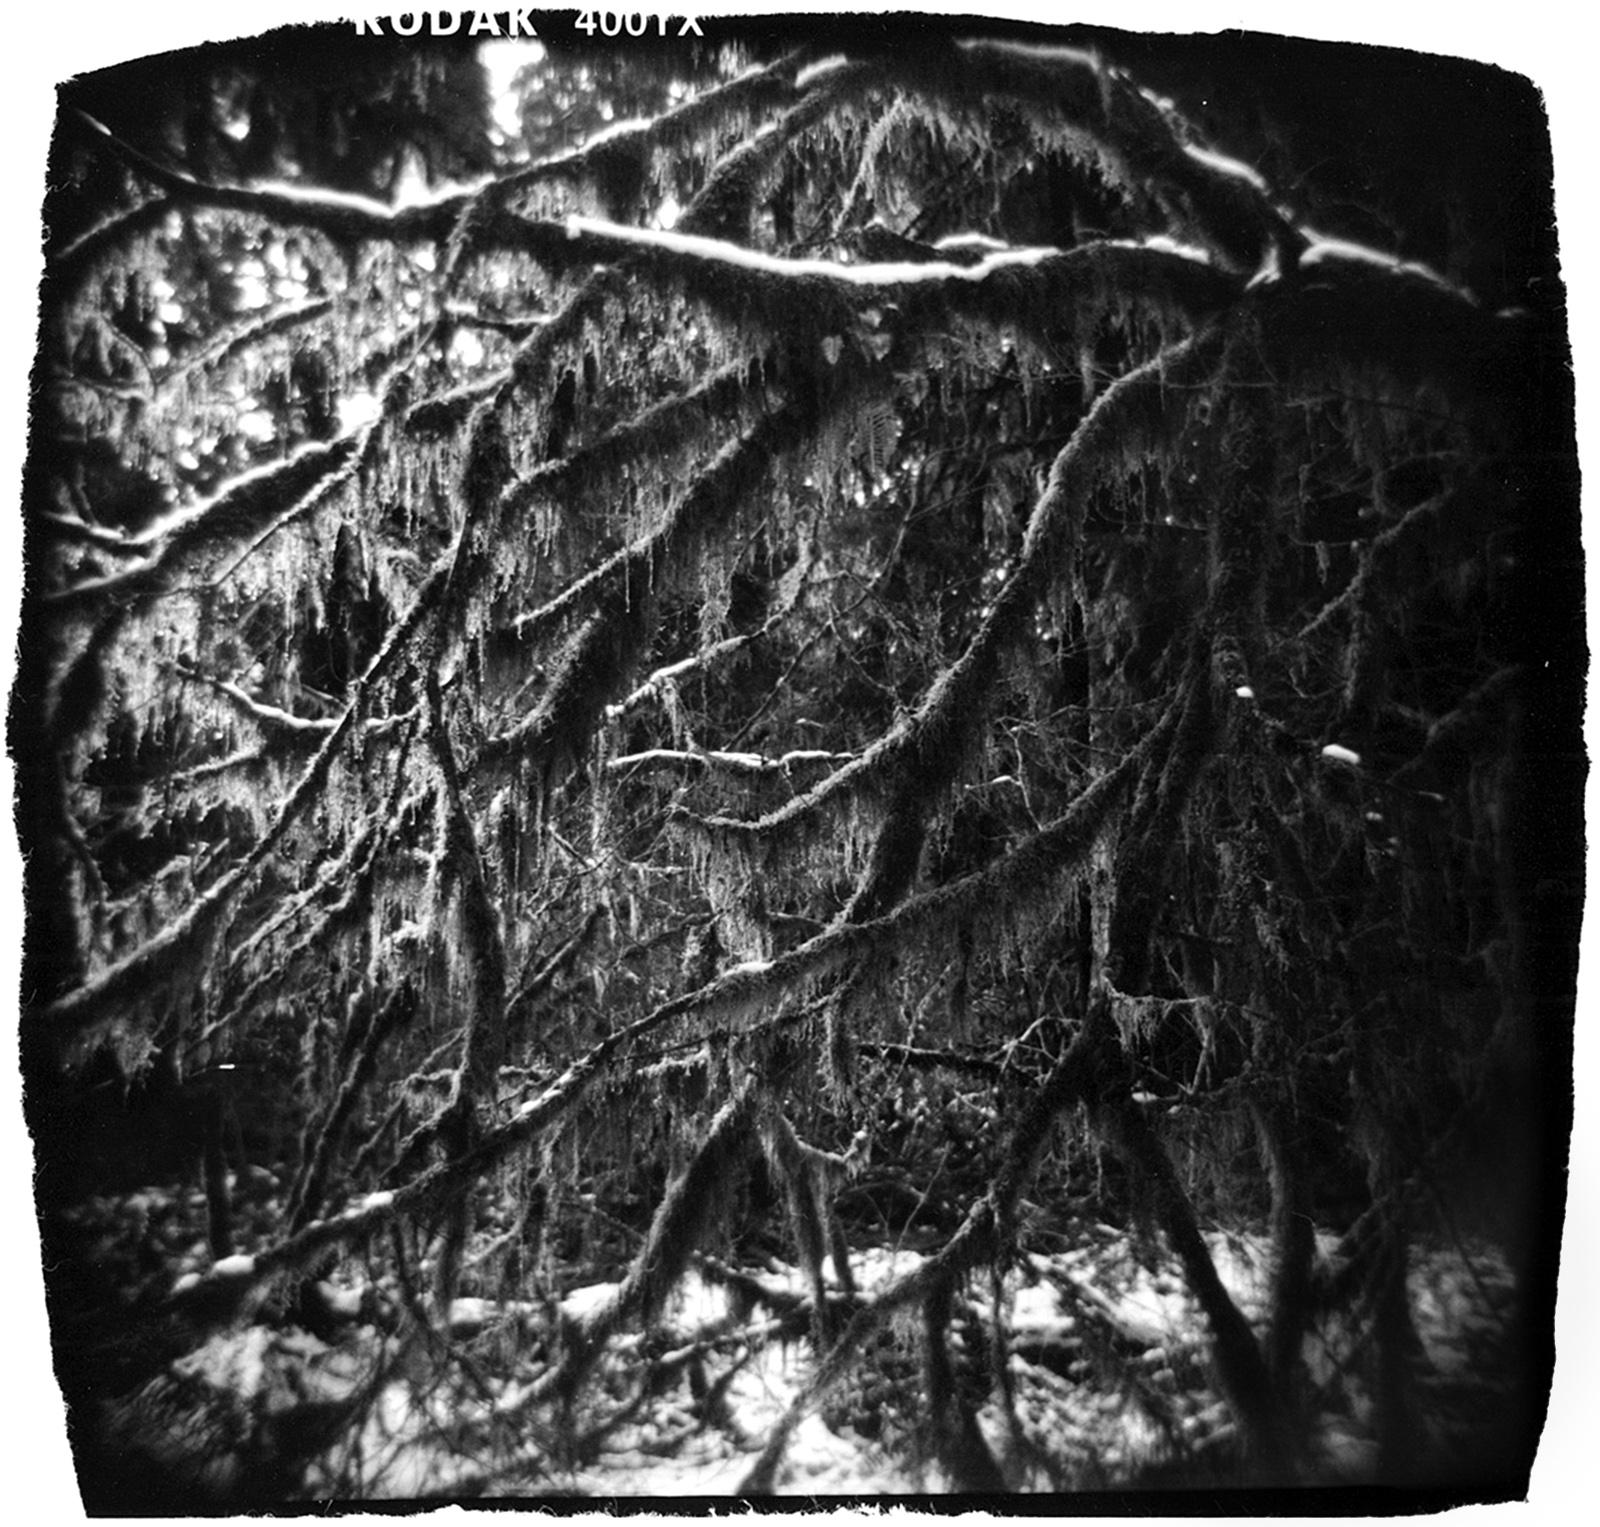 Hoh Rainforest in Snow 2008